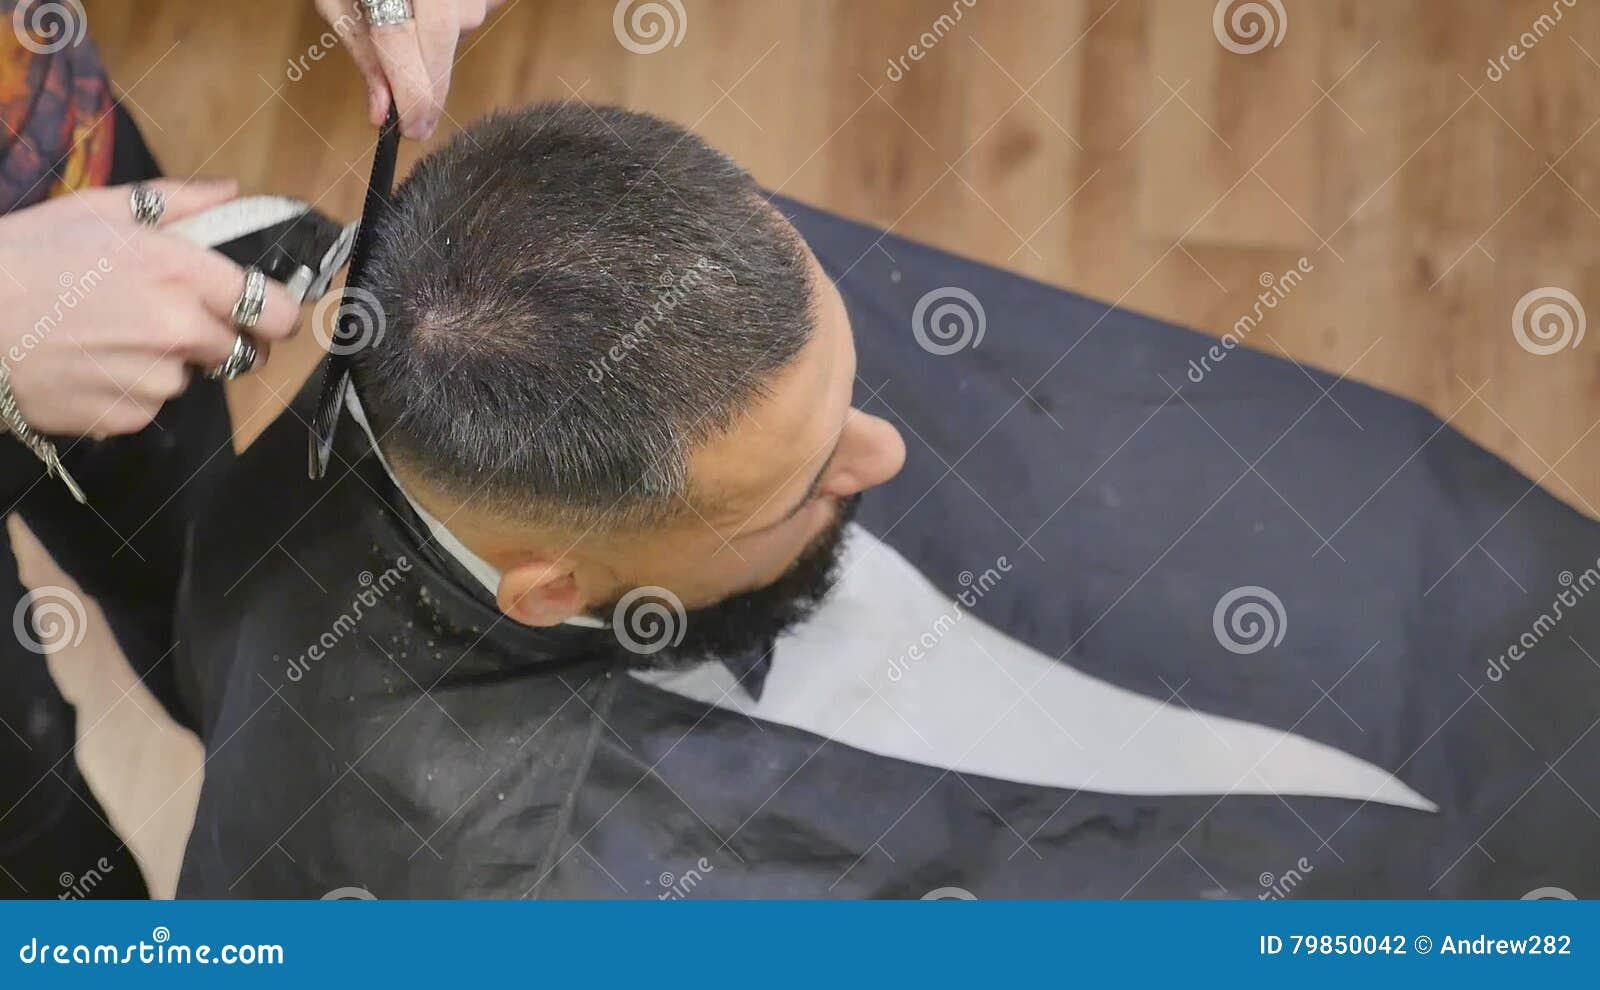 Haircut Men Barbershop Mens Hairdressers Barbers Barber Cuts The